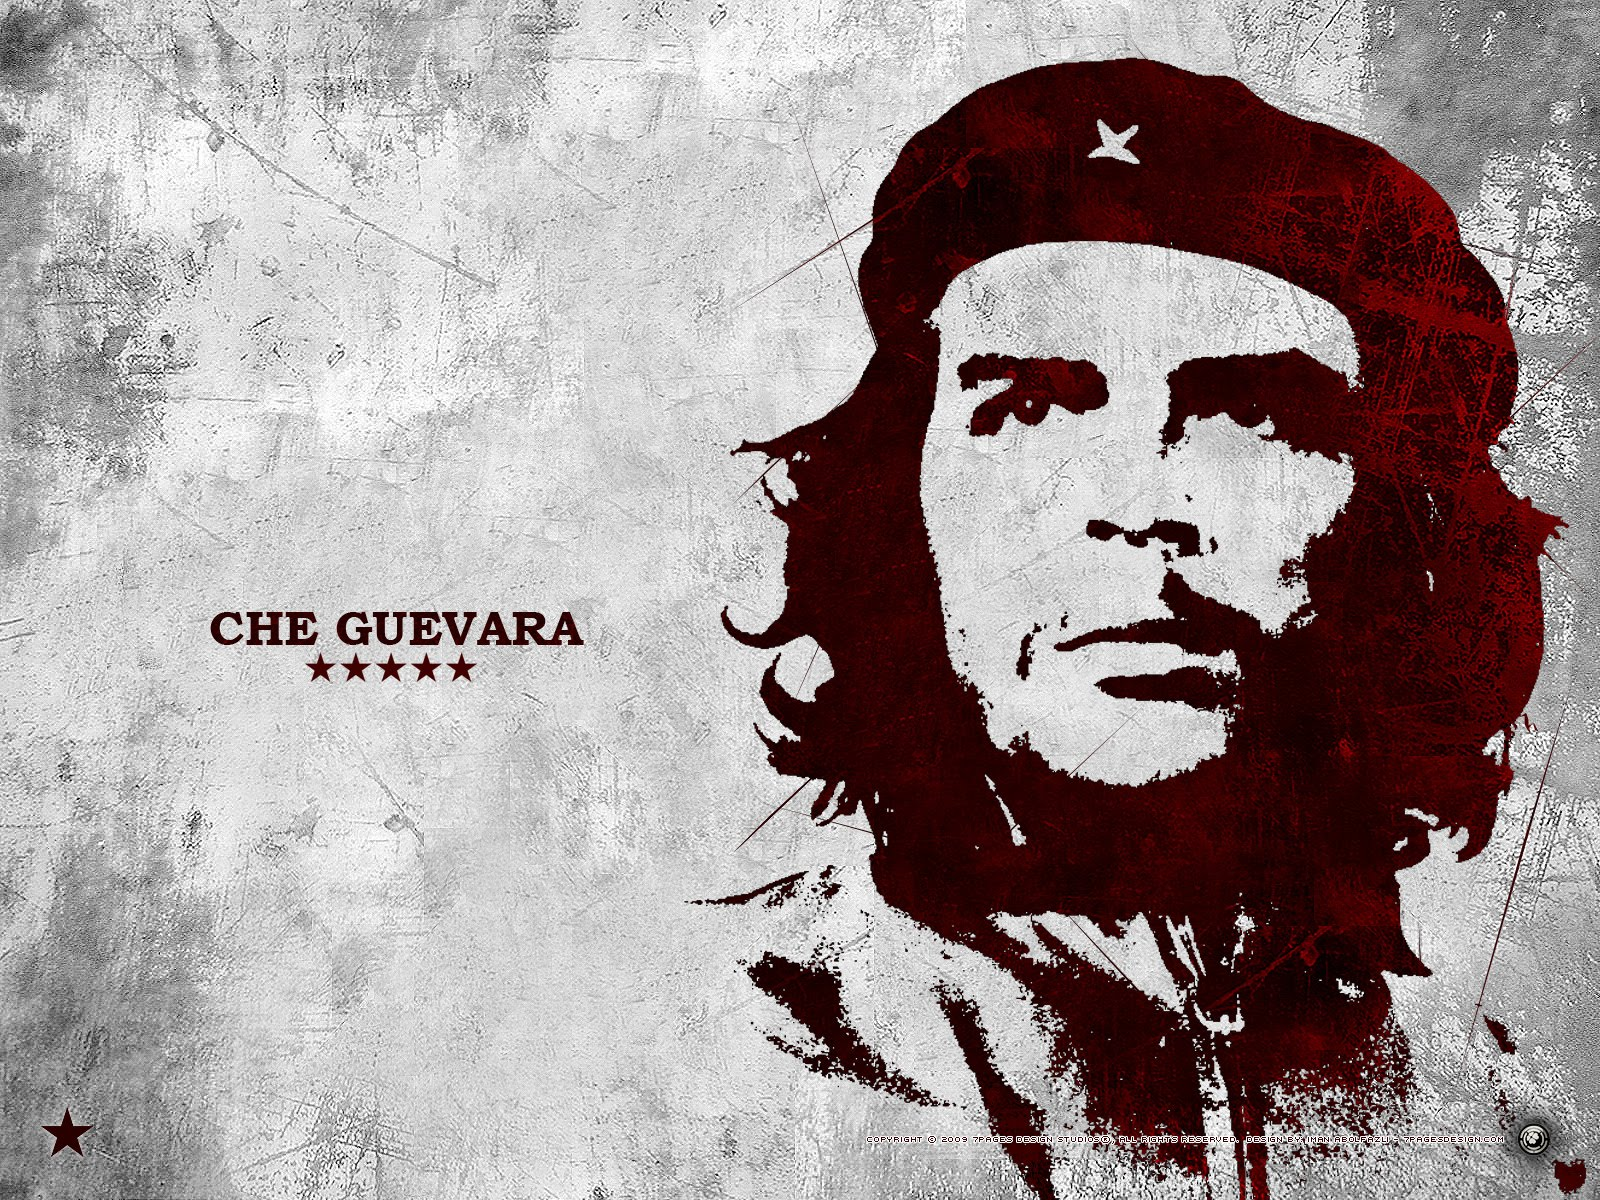 http://1.bp.blogspot.com/-_Bdg3WtfpcI/Txuu0iDg3hI/AAAAAAAAOSc/lkXxm_D3HC4/s1600/Che-Guevara-Wallpapers-2011.jpg